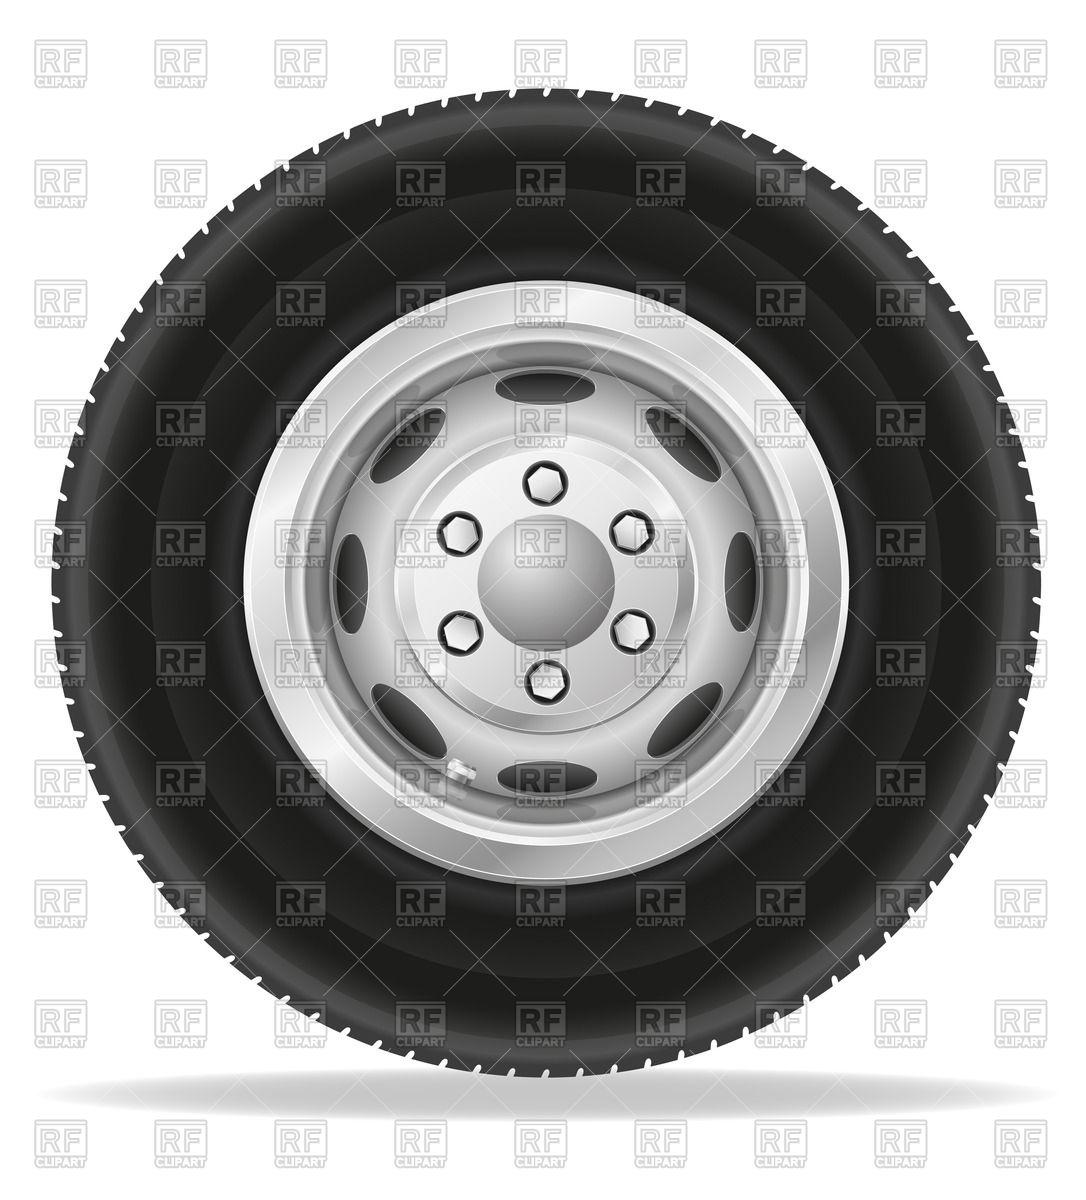 Wheel for truck Vector Image #44575.